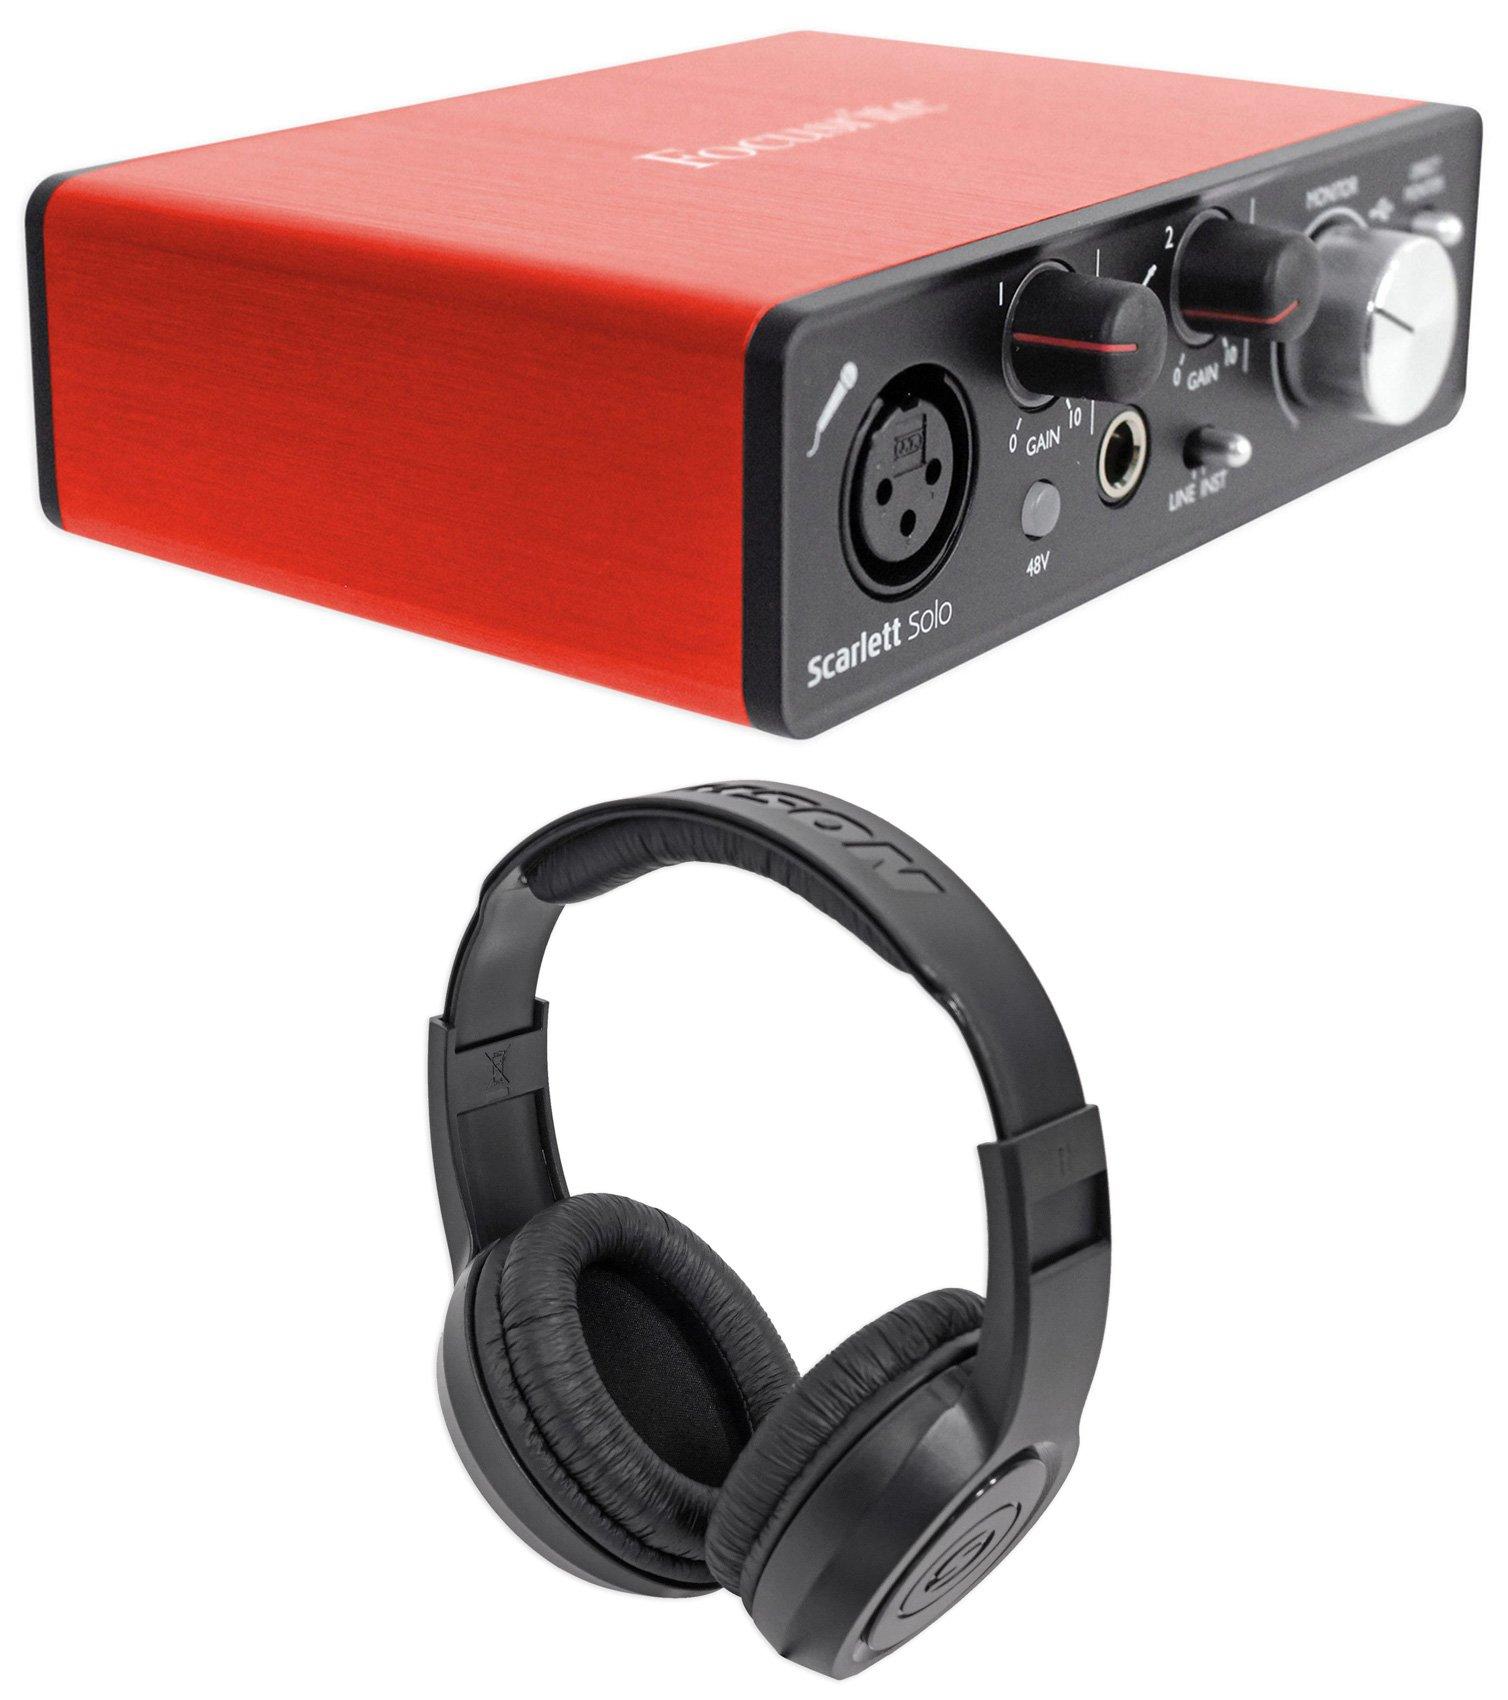 Focusrite SCARLETT SOLO 2nd Gen 192 KHz USB 2.0 Audio Interface+Samson Headphones by Focusrite